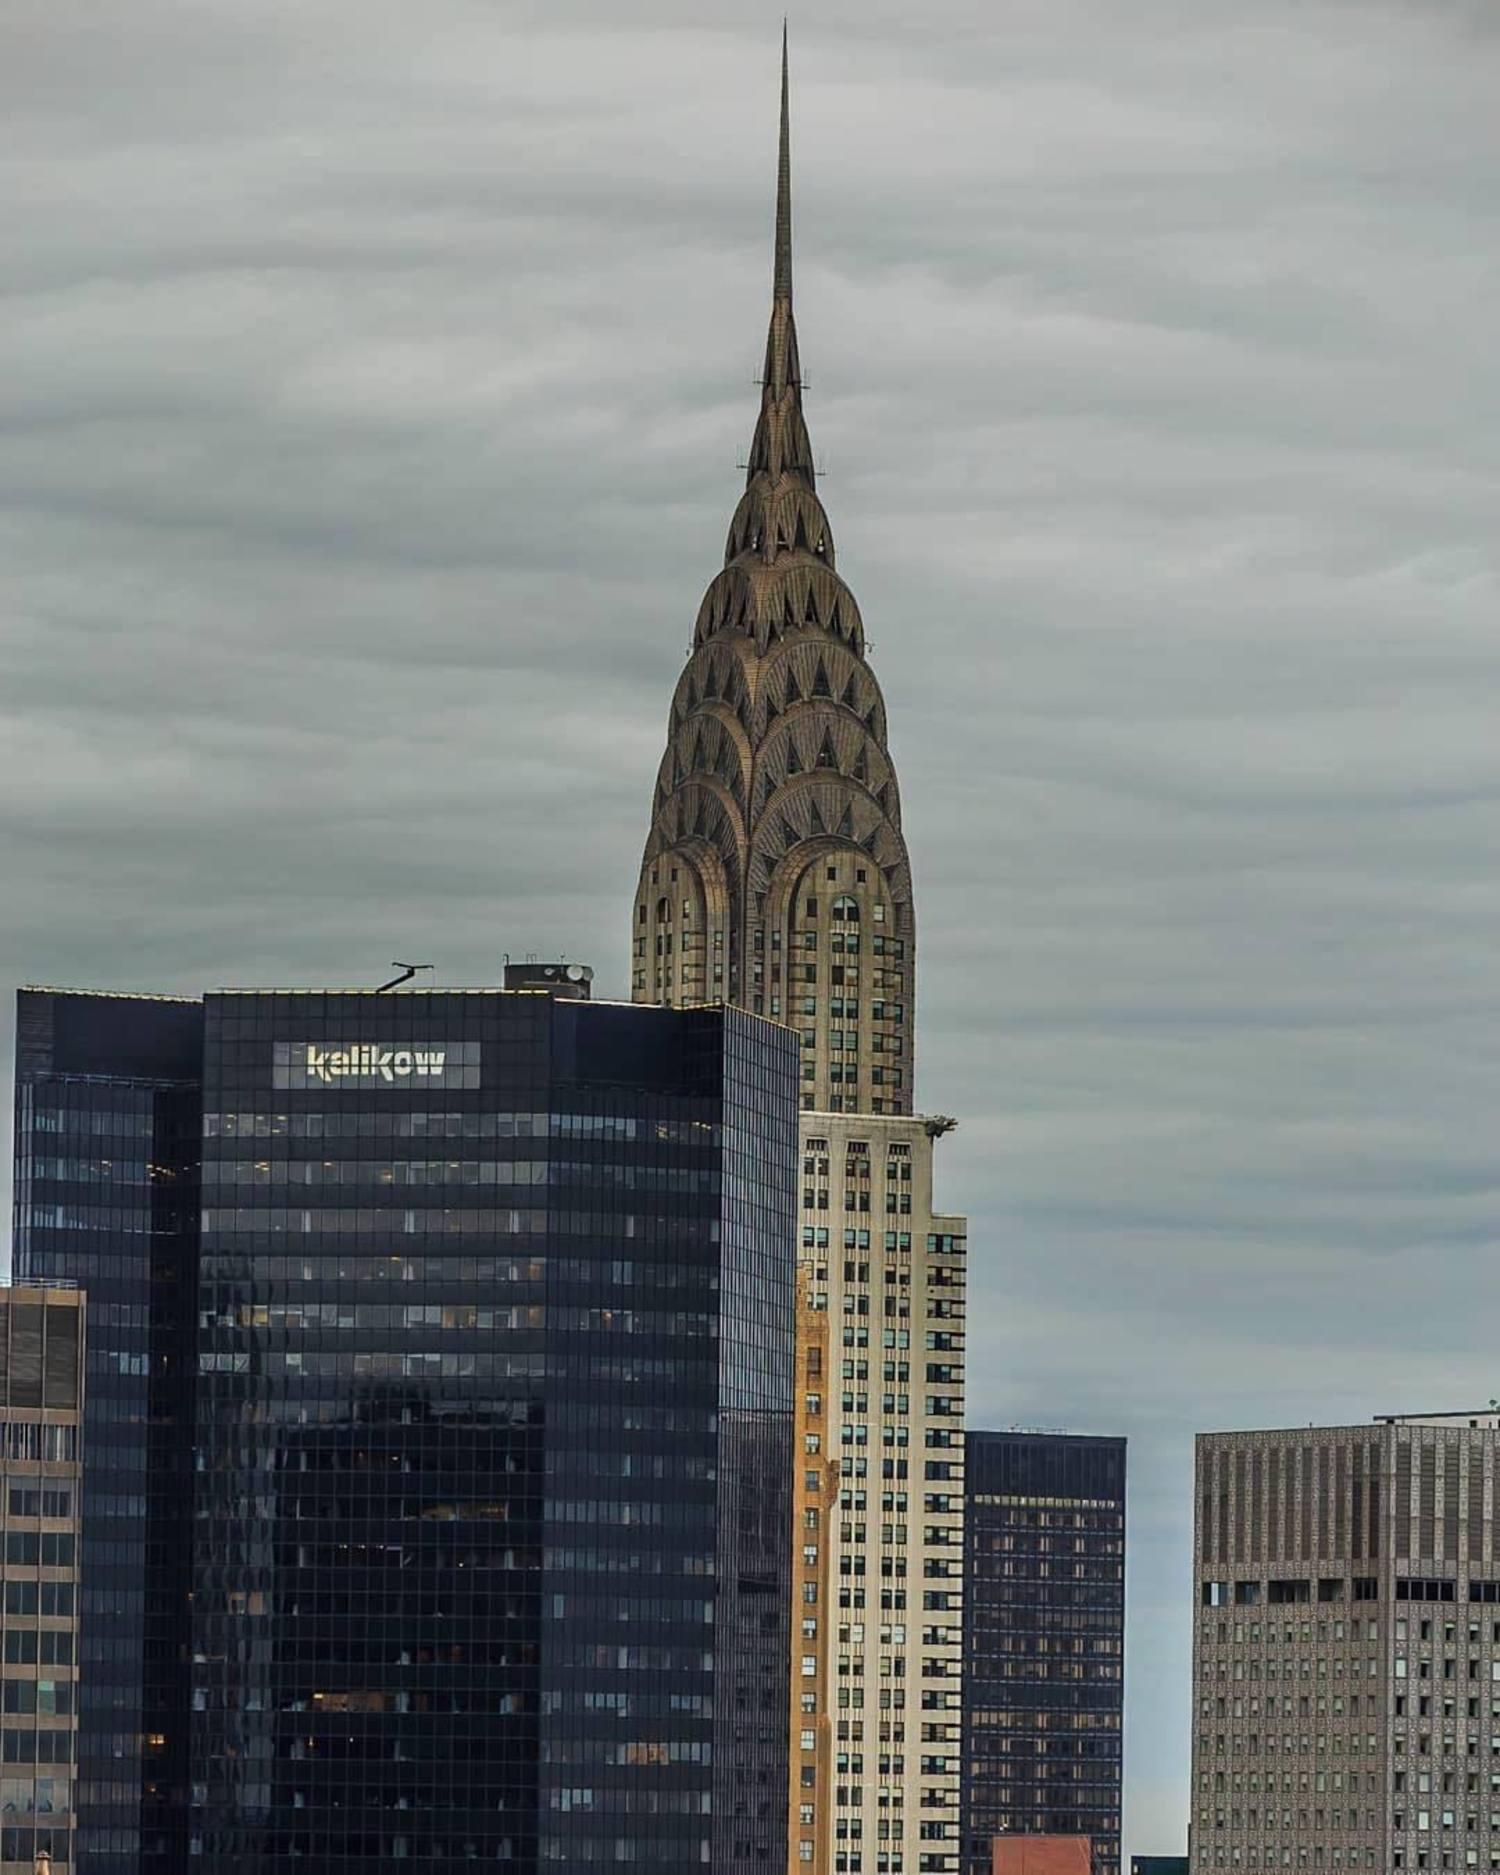 Chrysler Building, New York, New York. Photo via @killahwave #viewingnyc #newyork #newyorkcity #nyc #chryslerbuilding